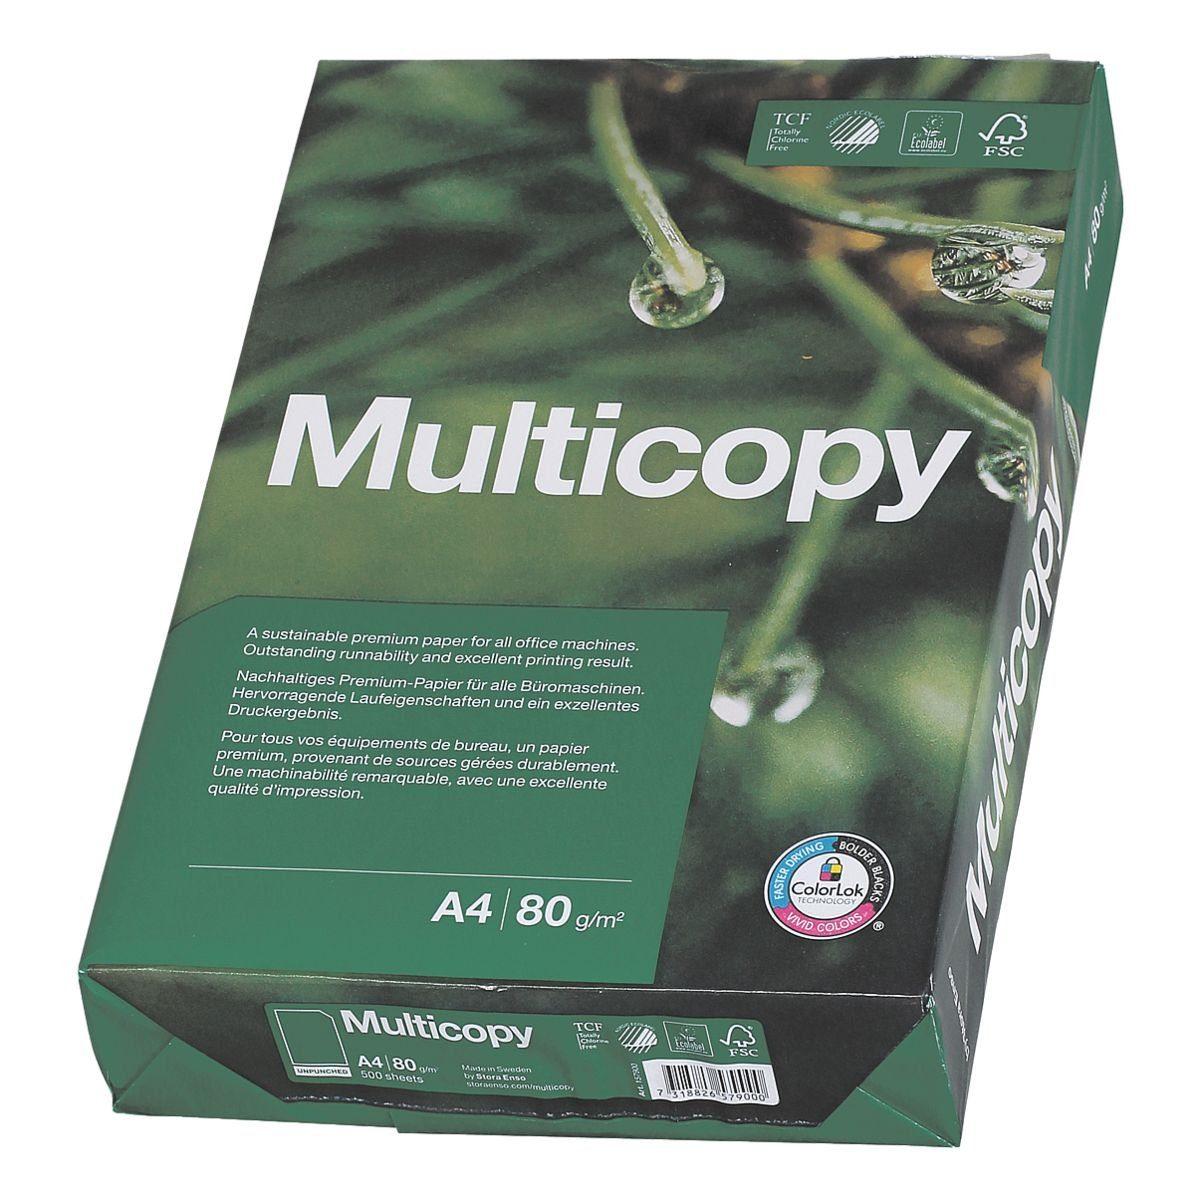 MULTICOPY Multifunktionspapier »MultiCopy«